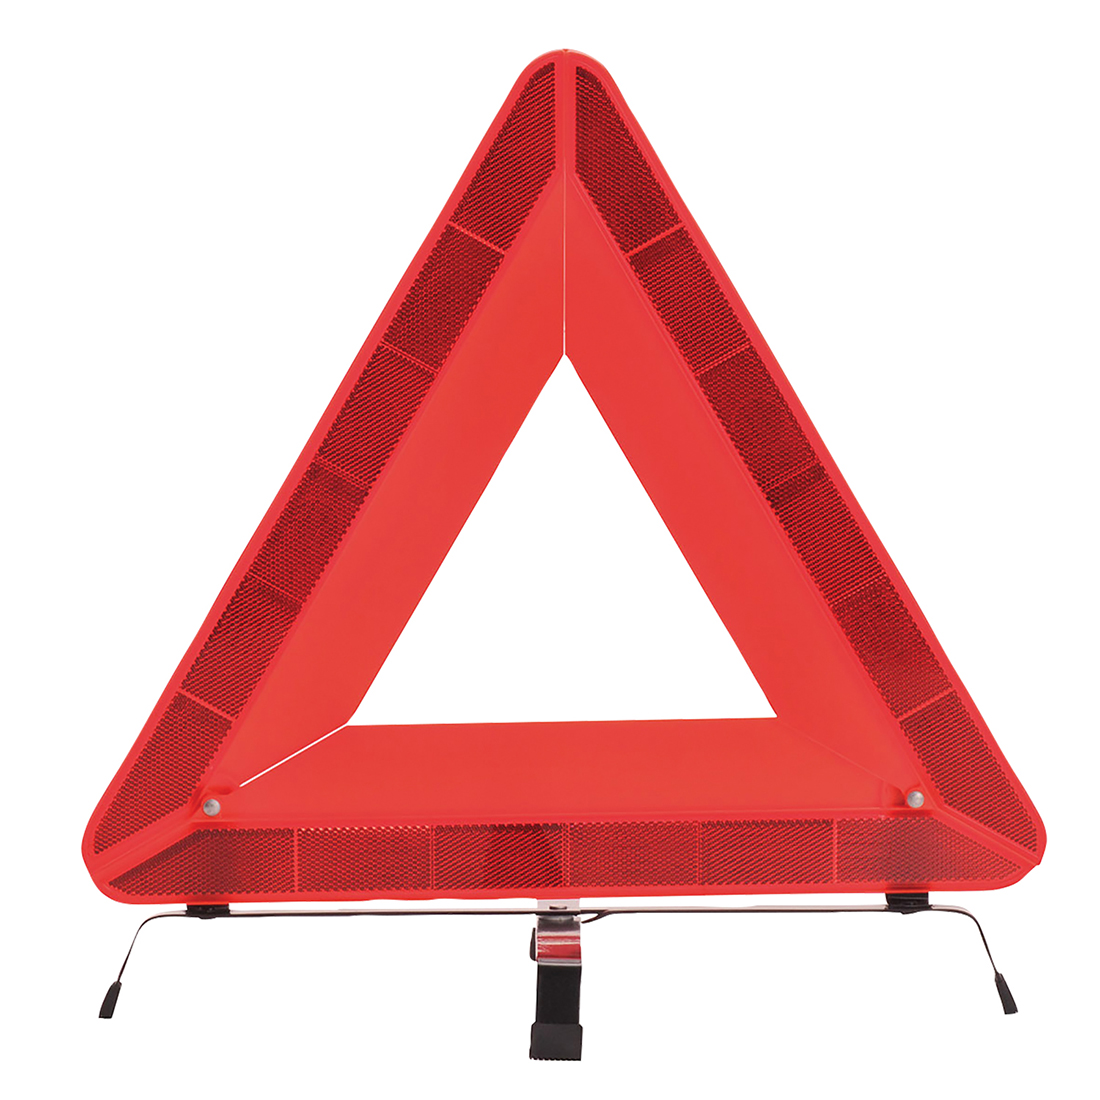 Portwest Folding Warning Triangle - HV10